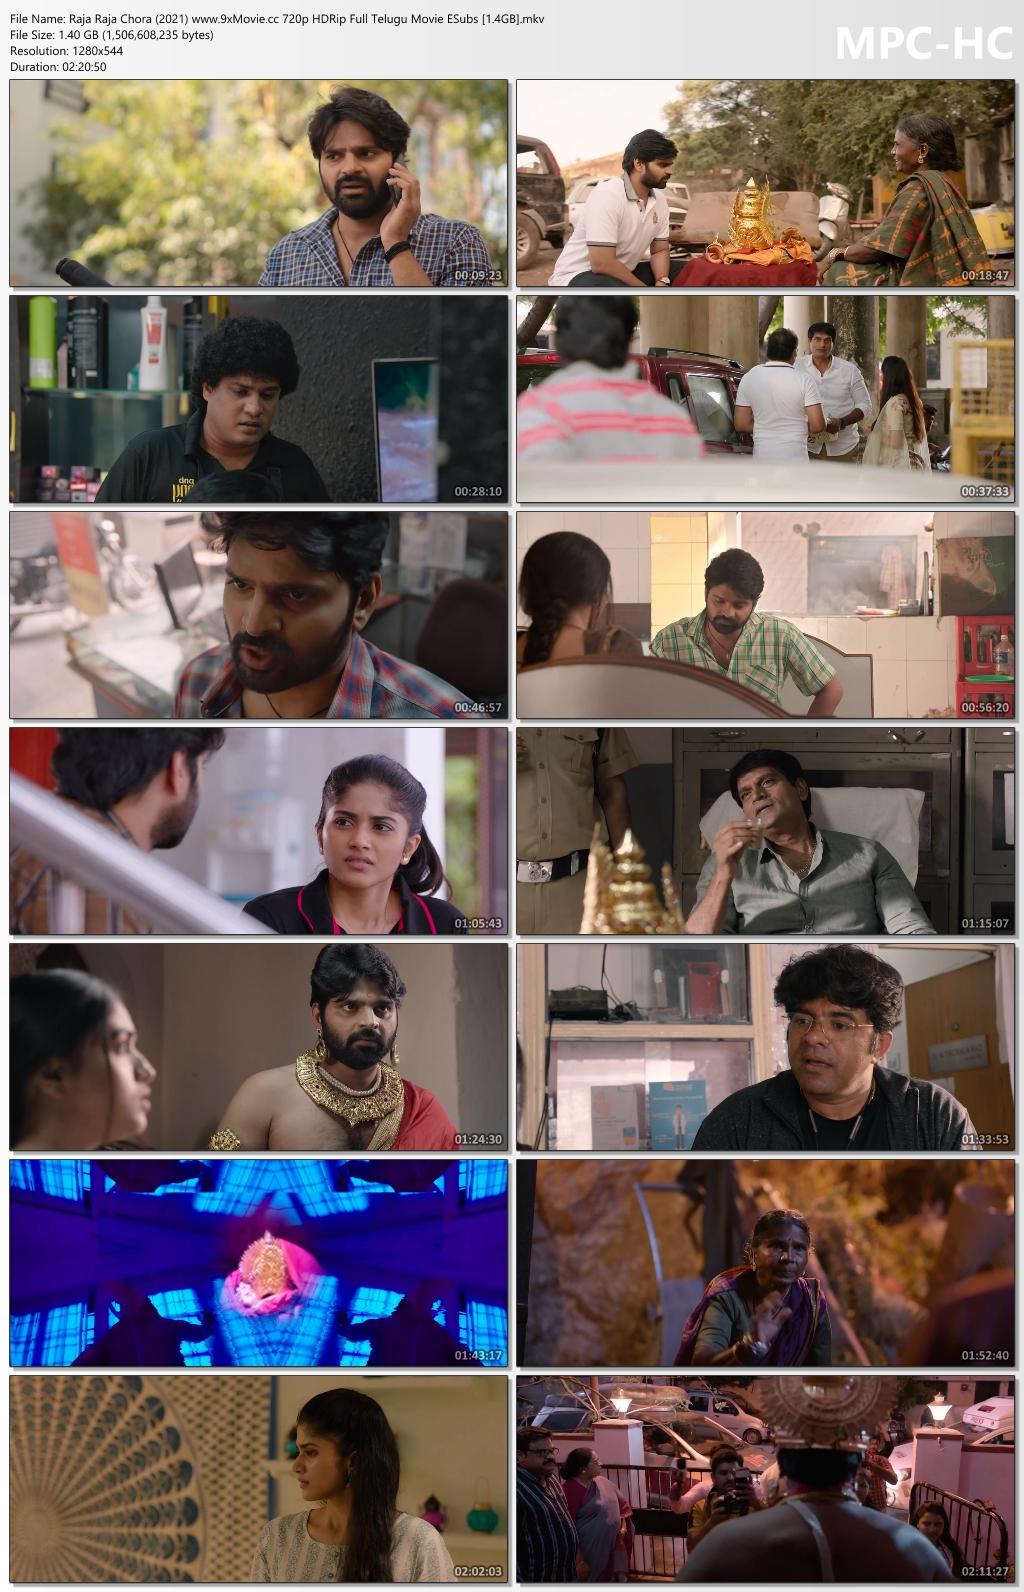 Raja-Raja-Chora-2021-www-9x-Movie-cc-720p-HDRip-Full-Telugu-Movie-ESubs-1-4-GB-mkv